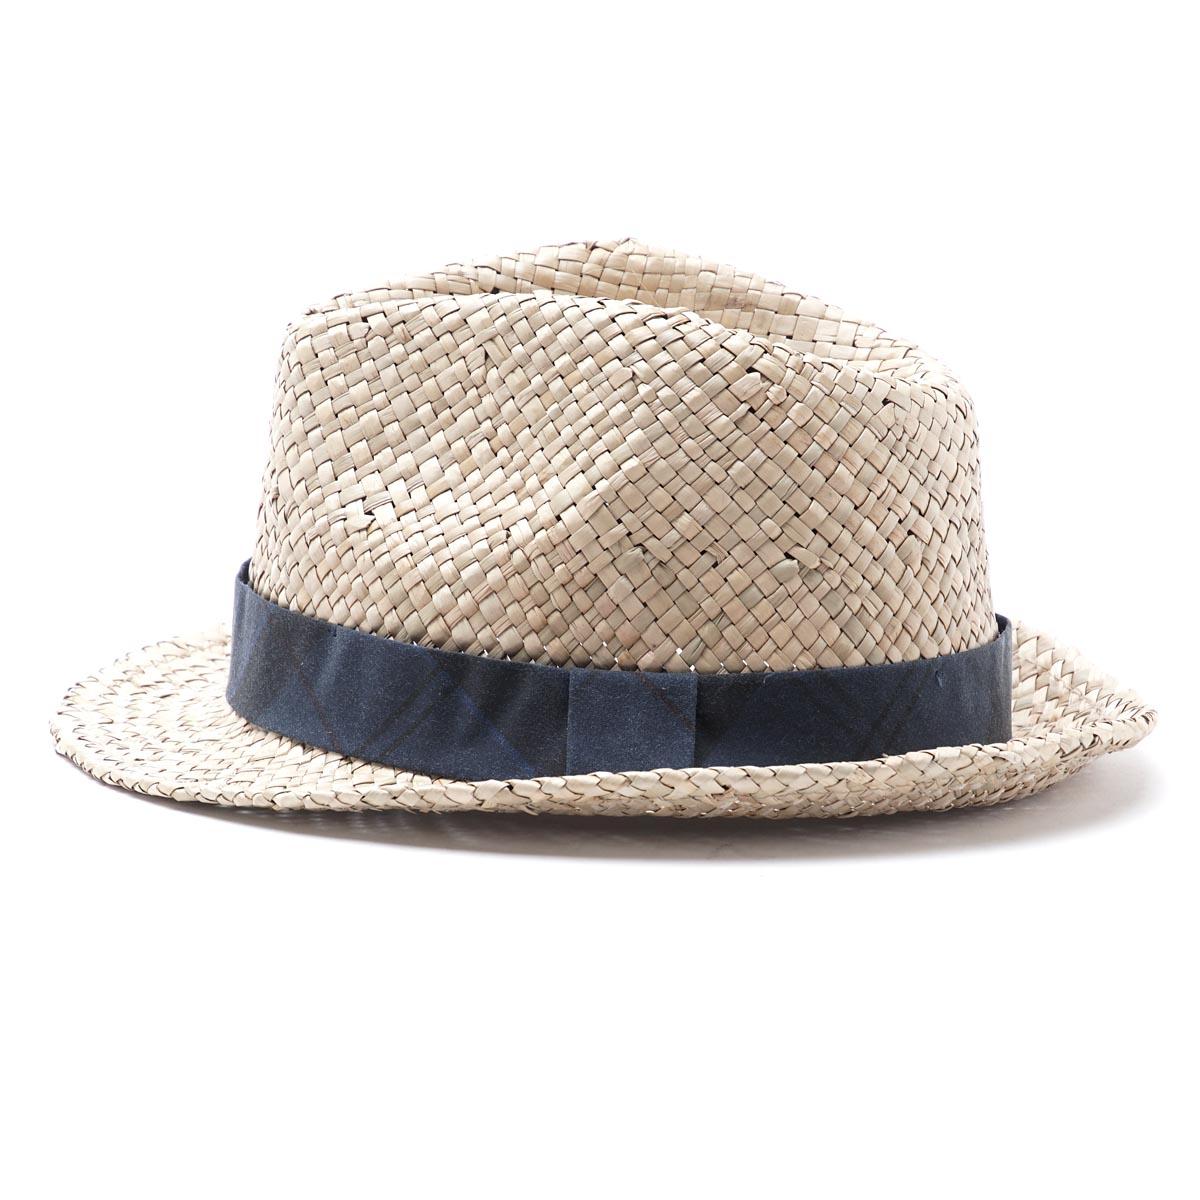 babua Barbour帽子舒適之帽中的去便帽TARTAN TRIMMED TRILBY NATURAL淺駝色派mha0353be11 natural人